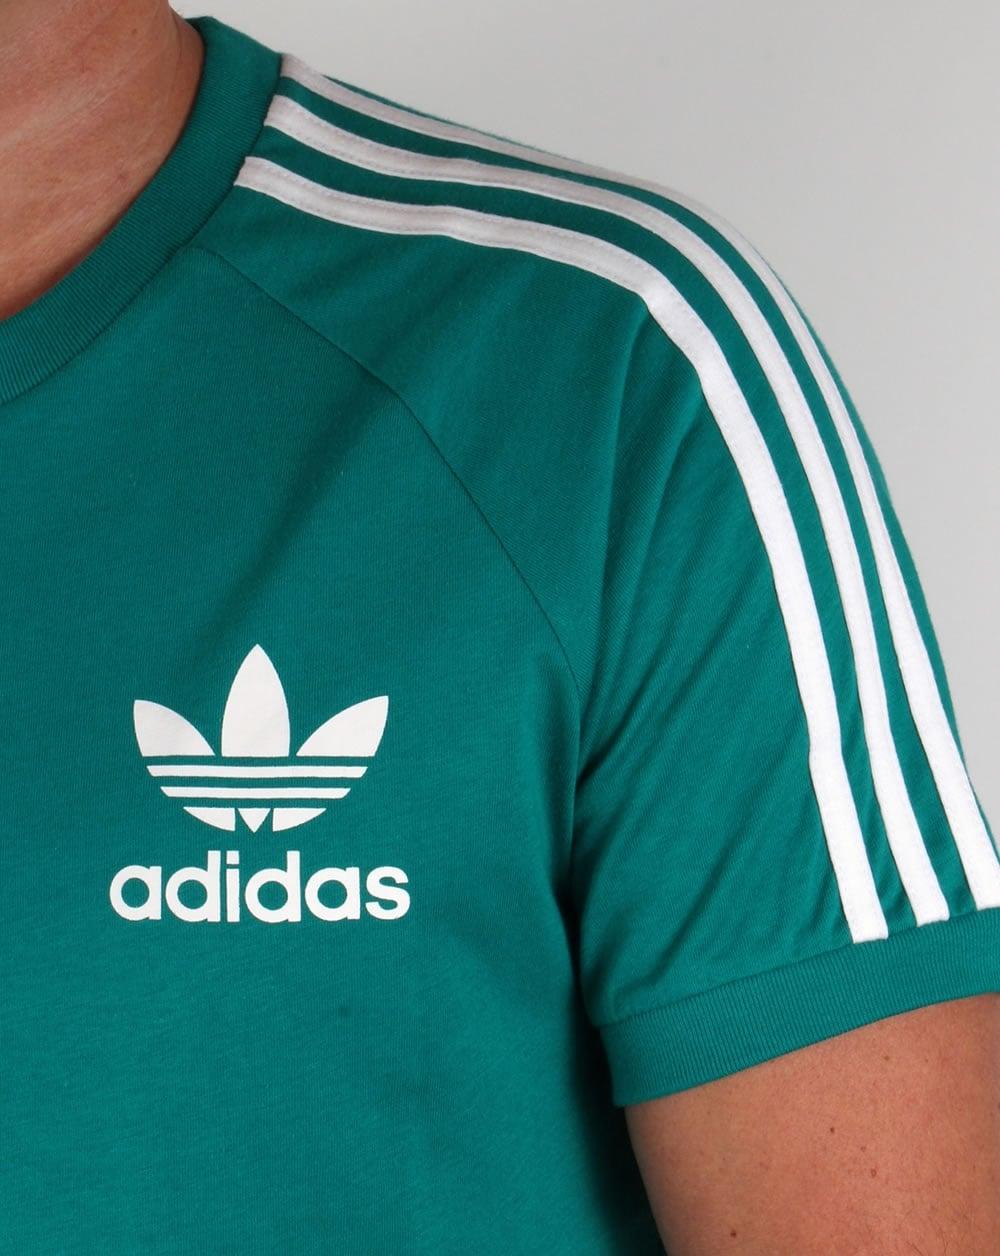 adidas originals trefoil 3 stripes tshirt eqt greenretro